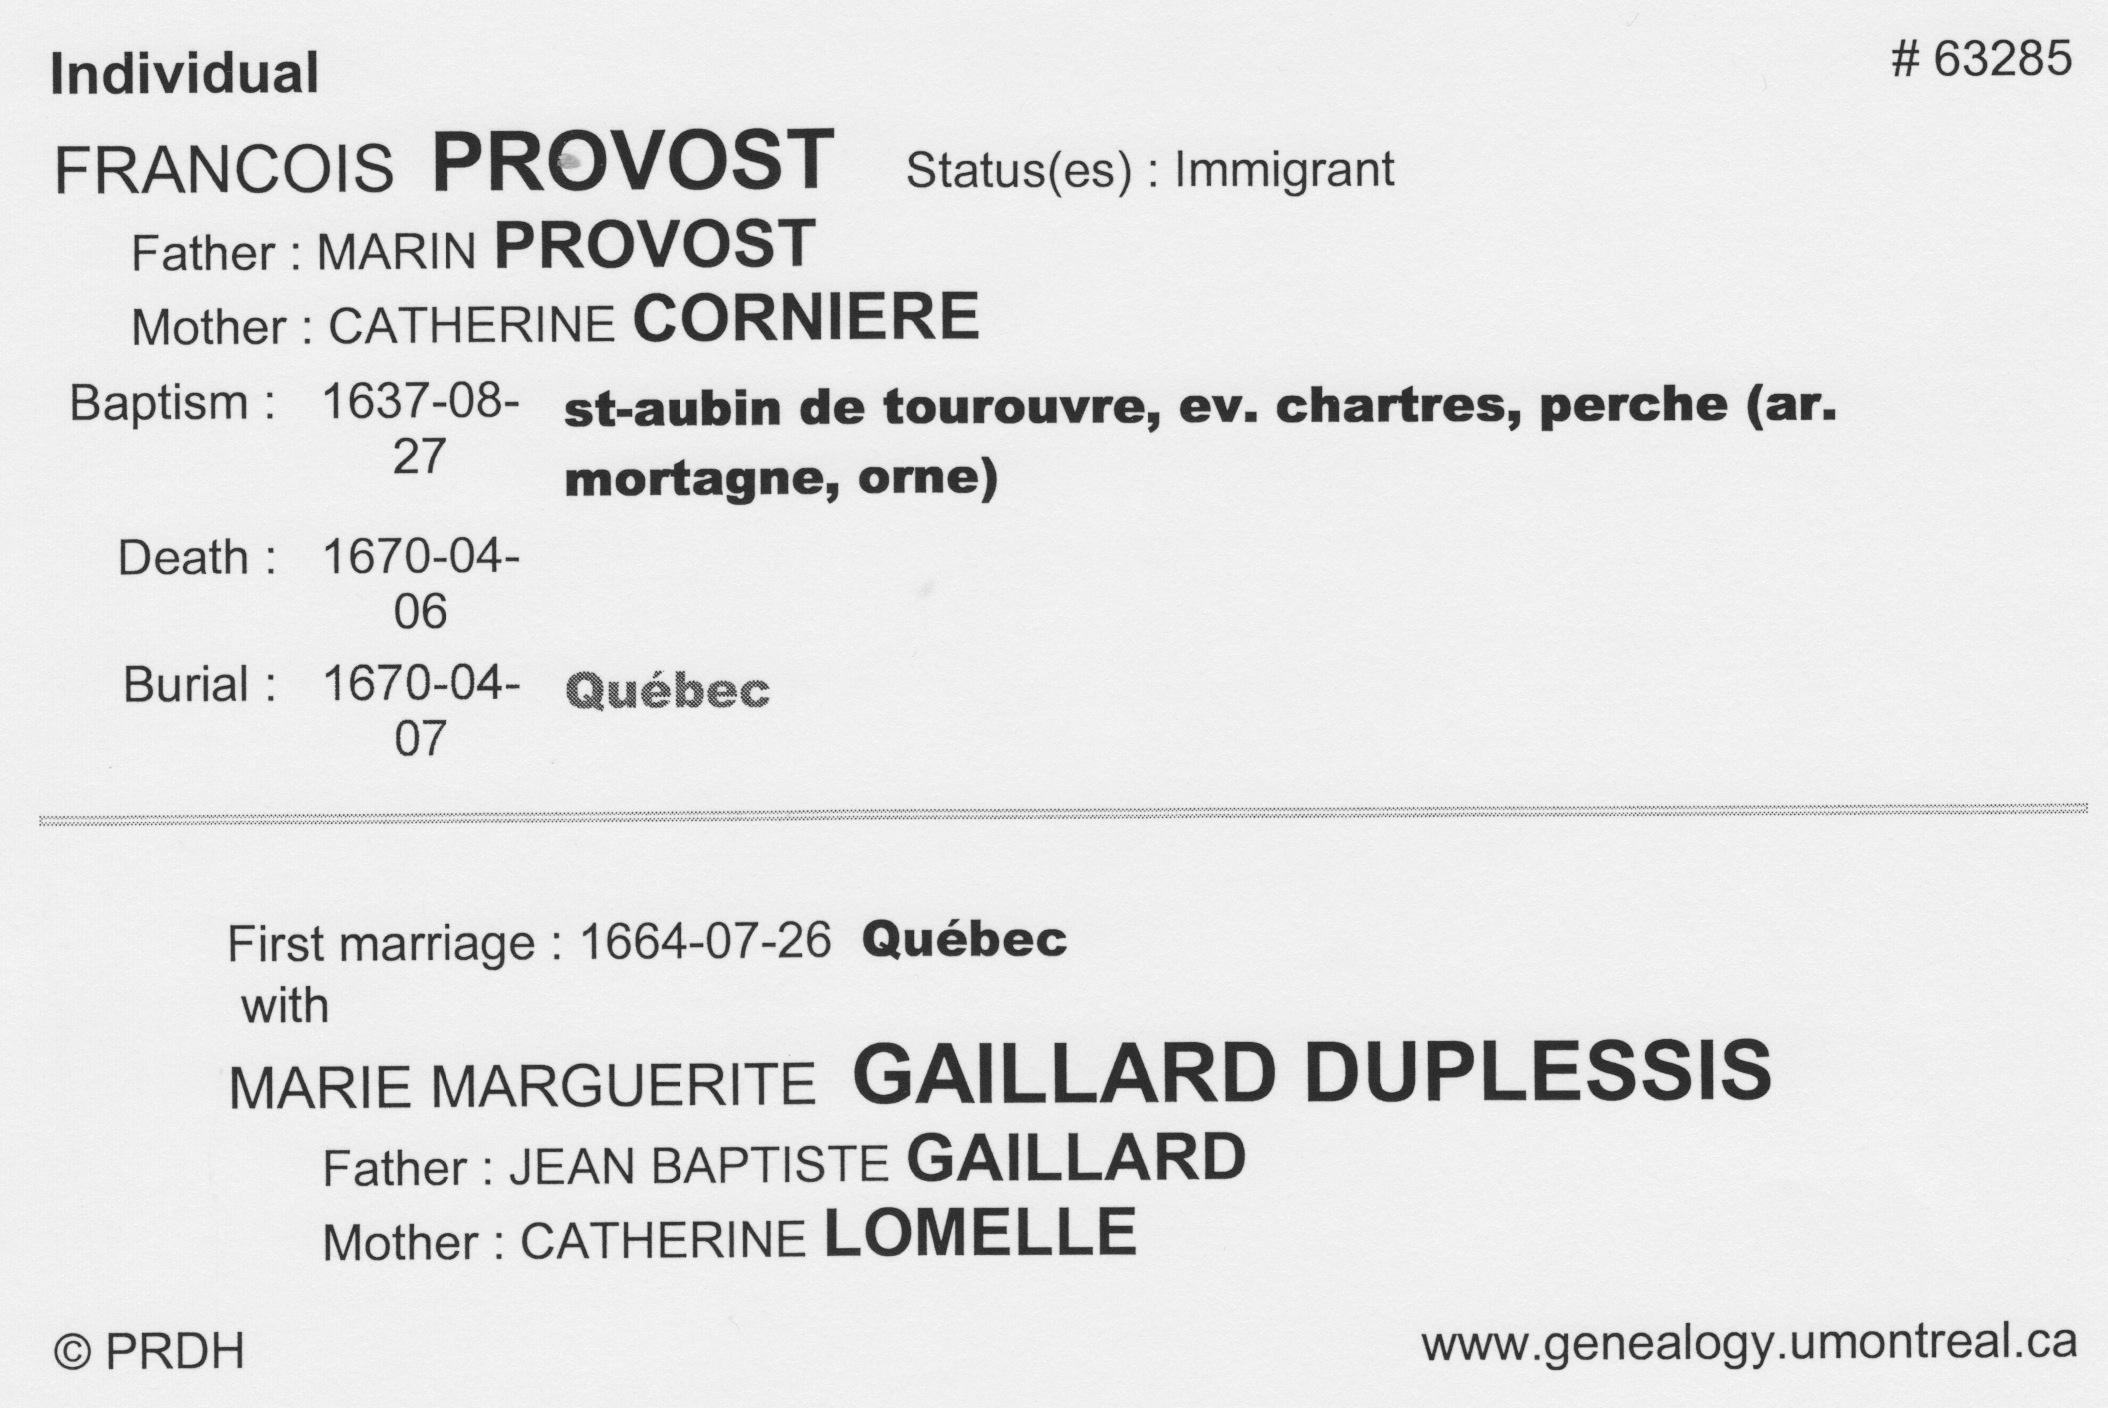 Francois Provost